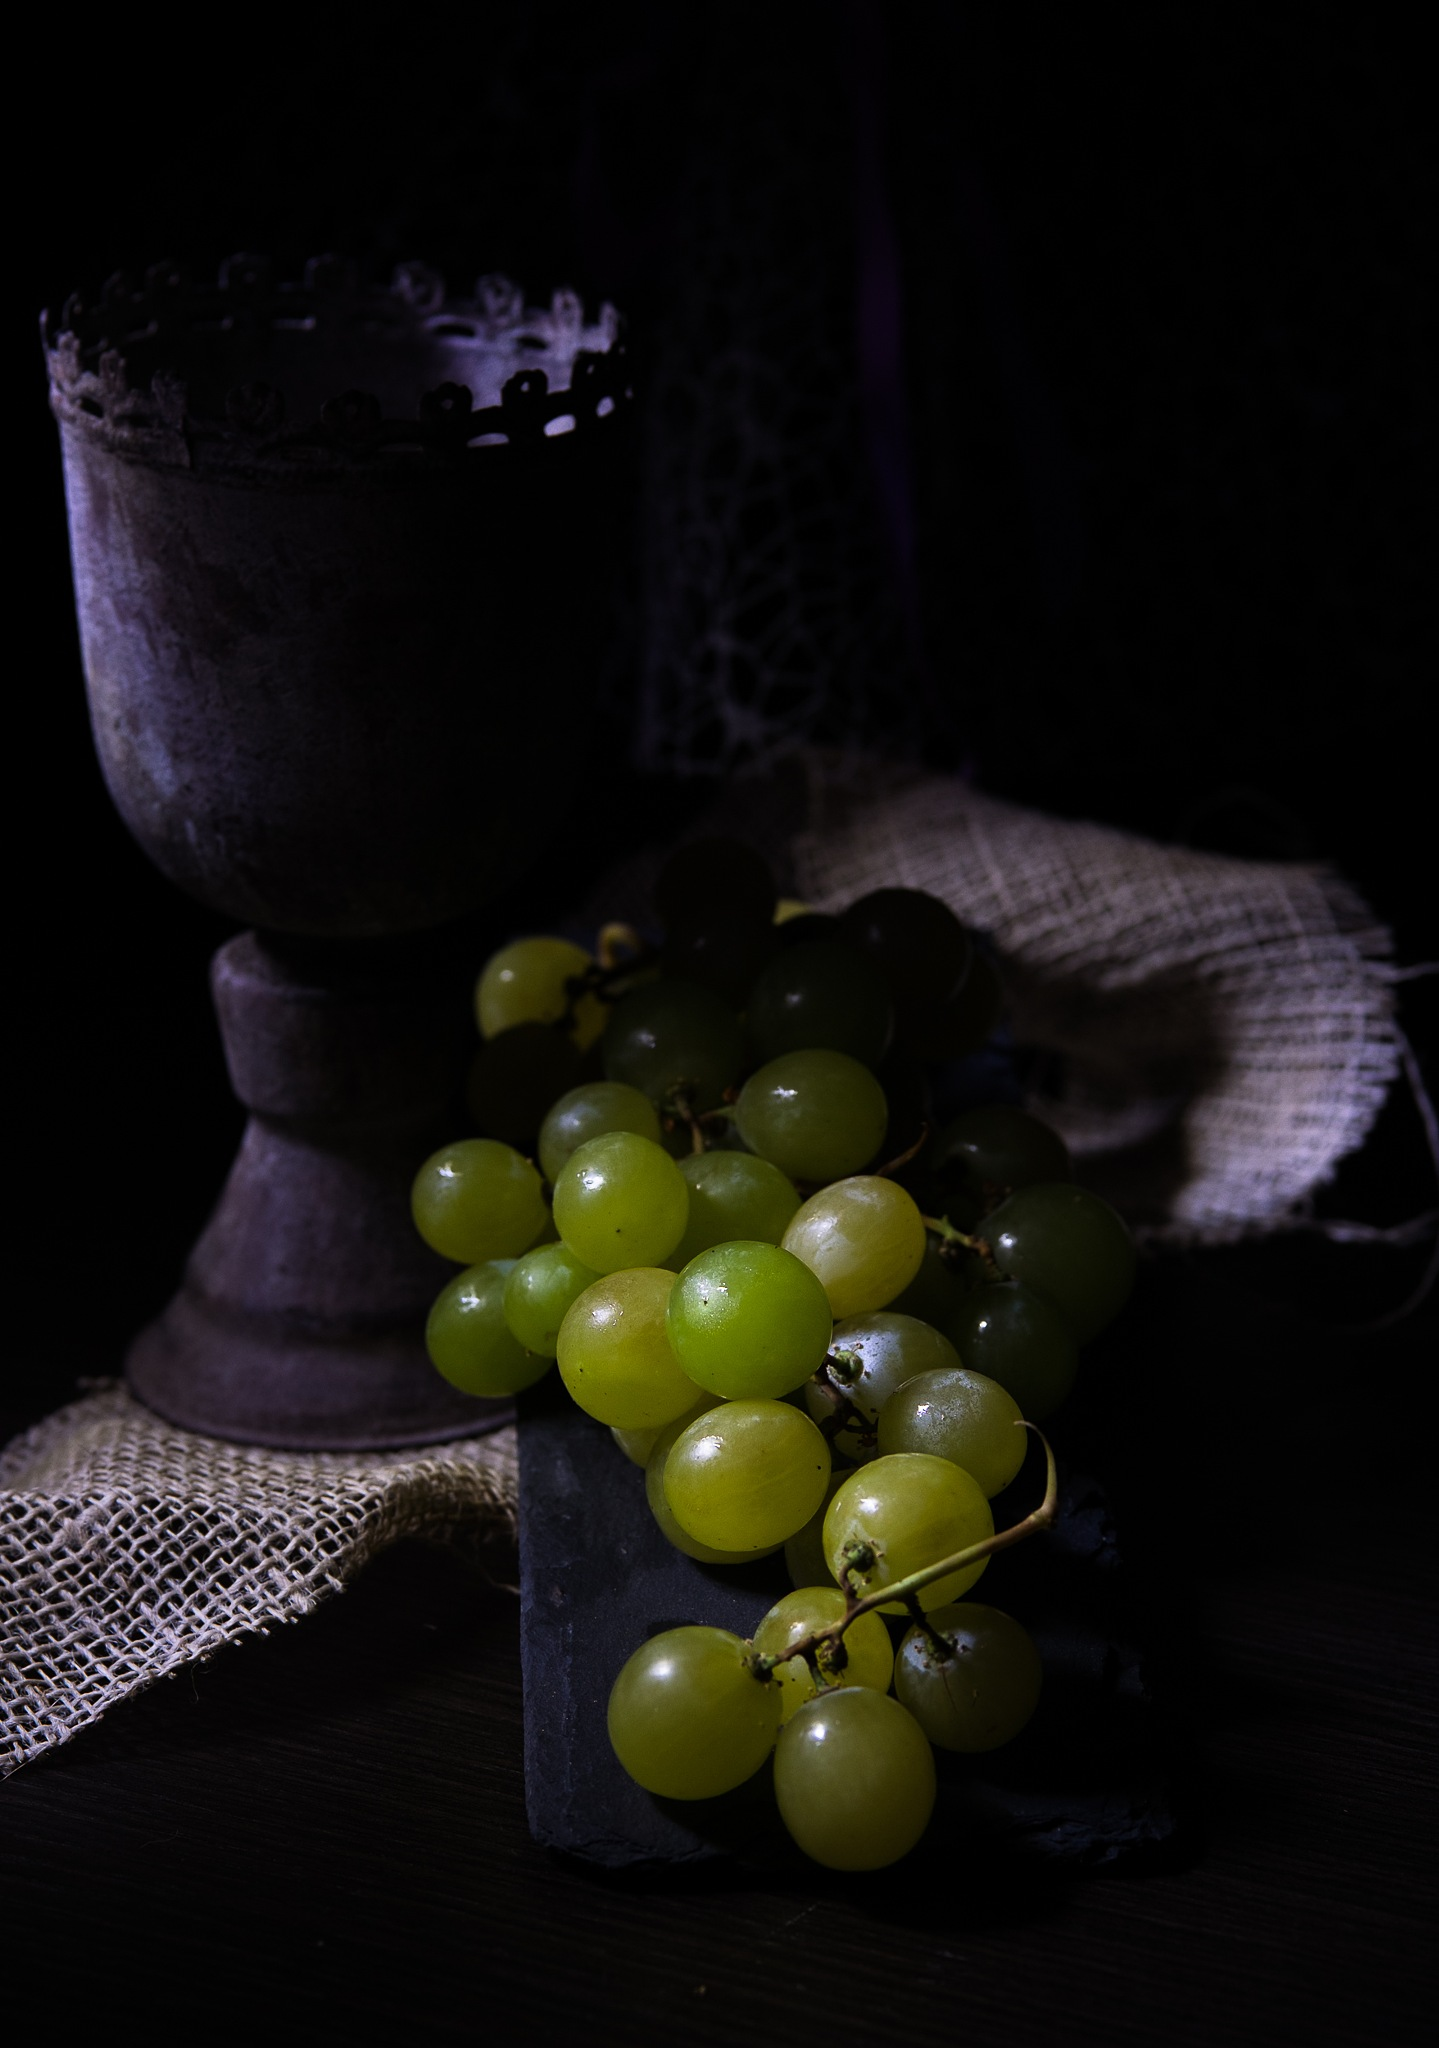 ... La Regina della tavola .. by enricosottocorna